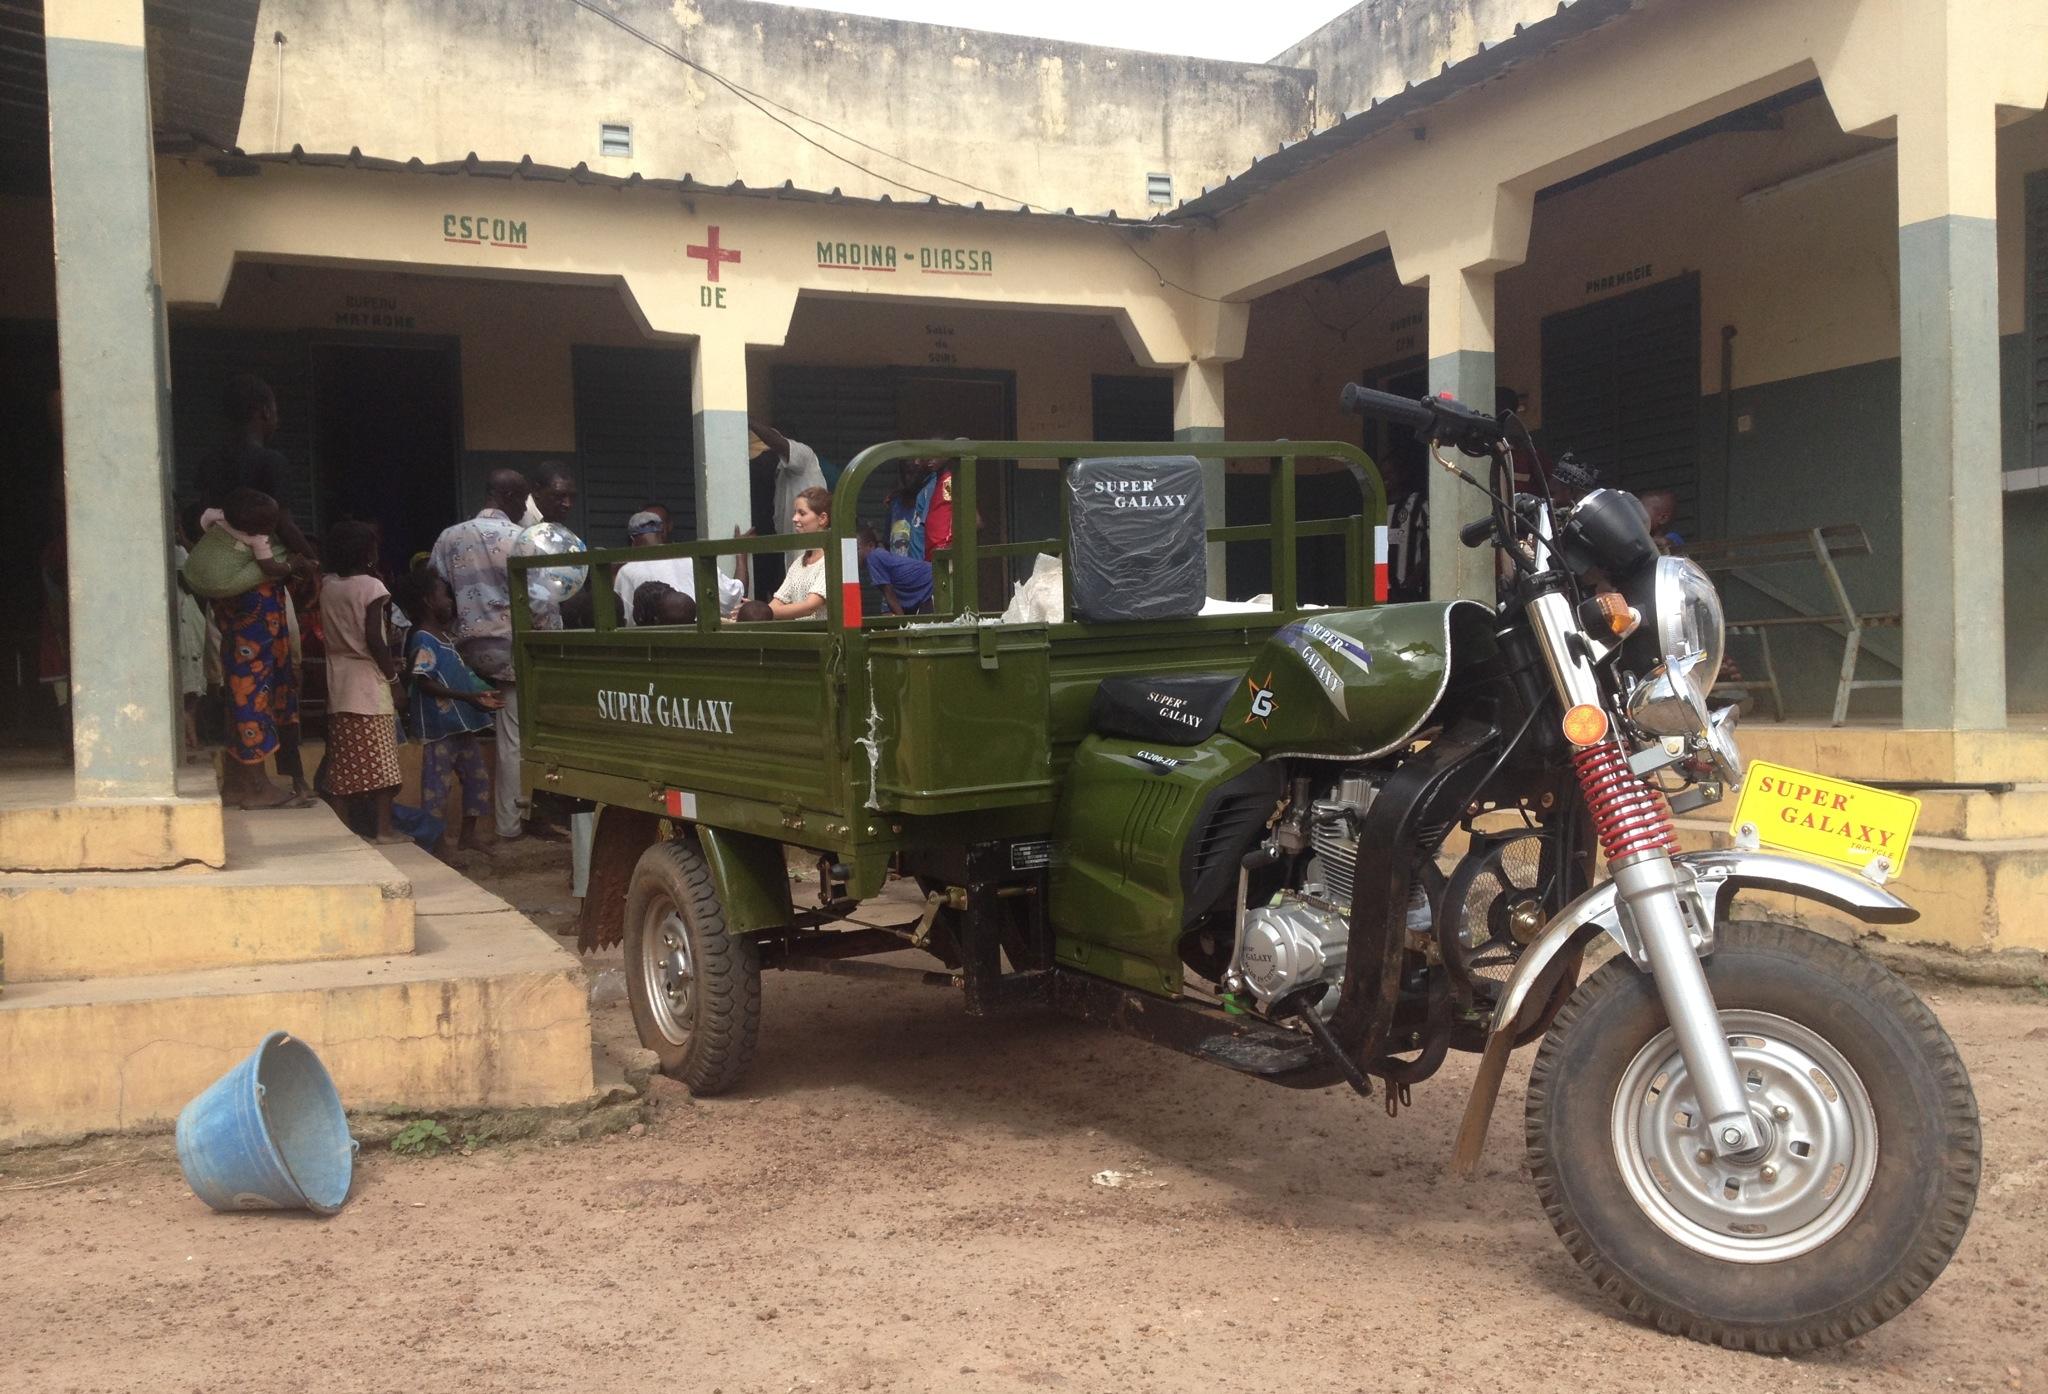 Ein Motorrad für Madina Diassa